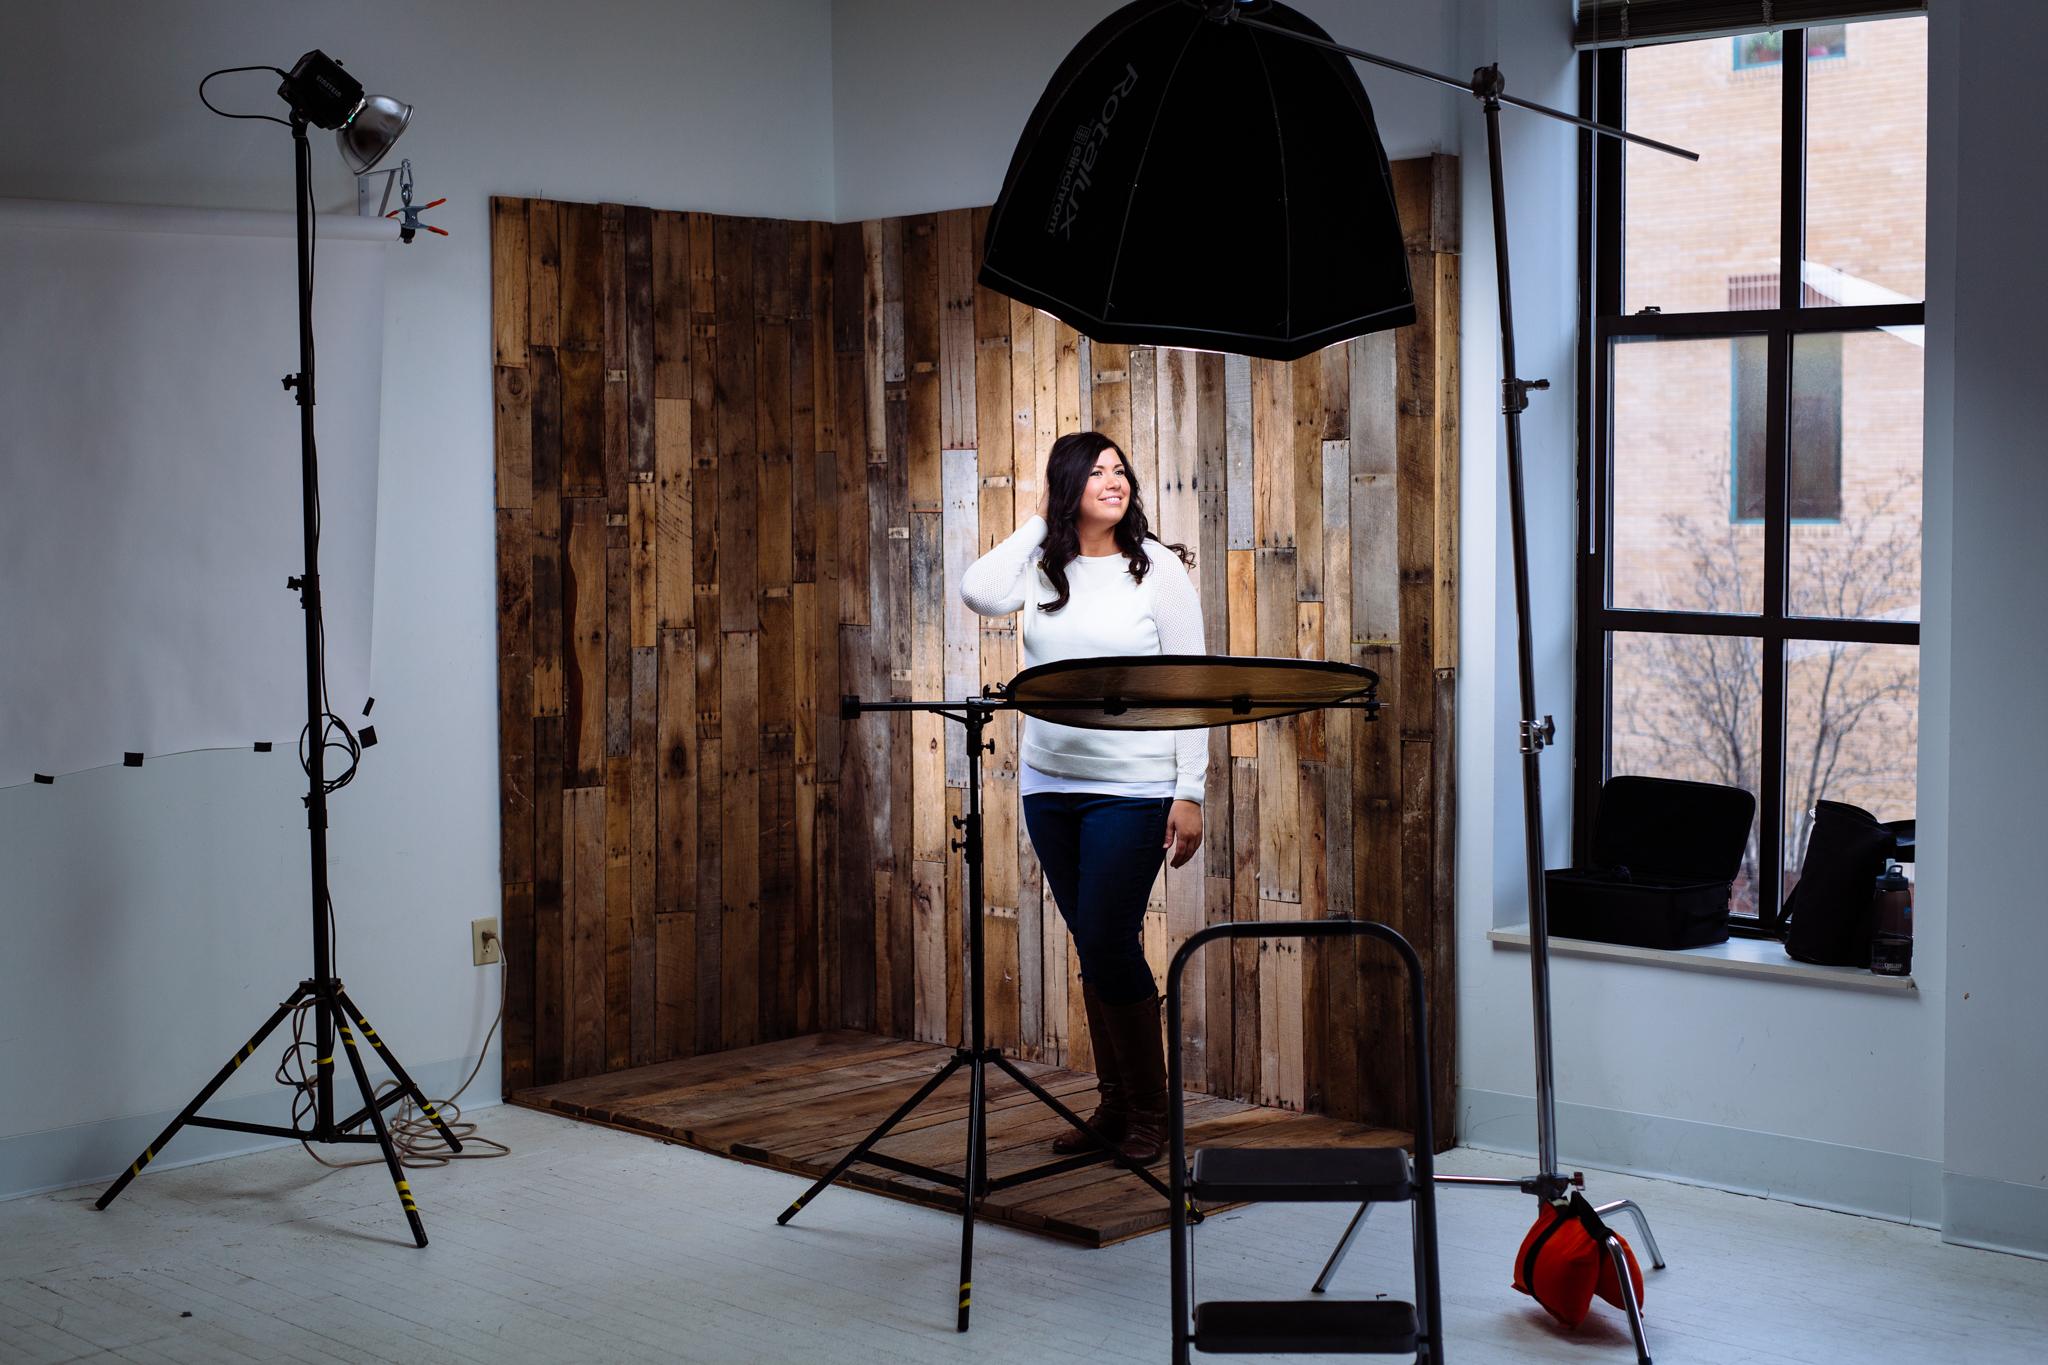 lafayette-photo-studio-rental.jpg